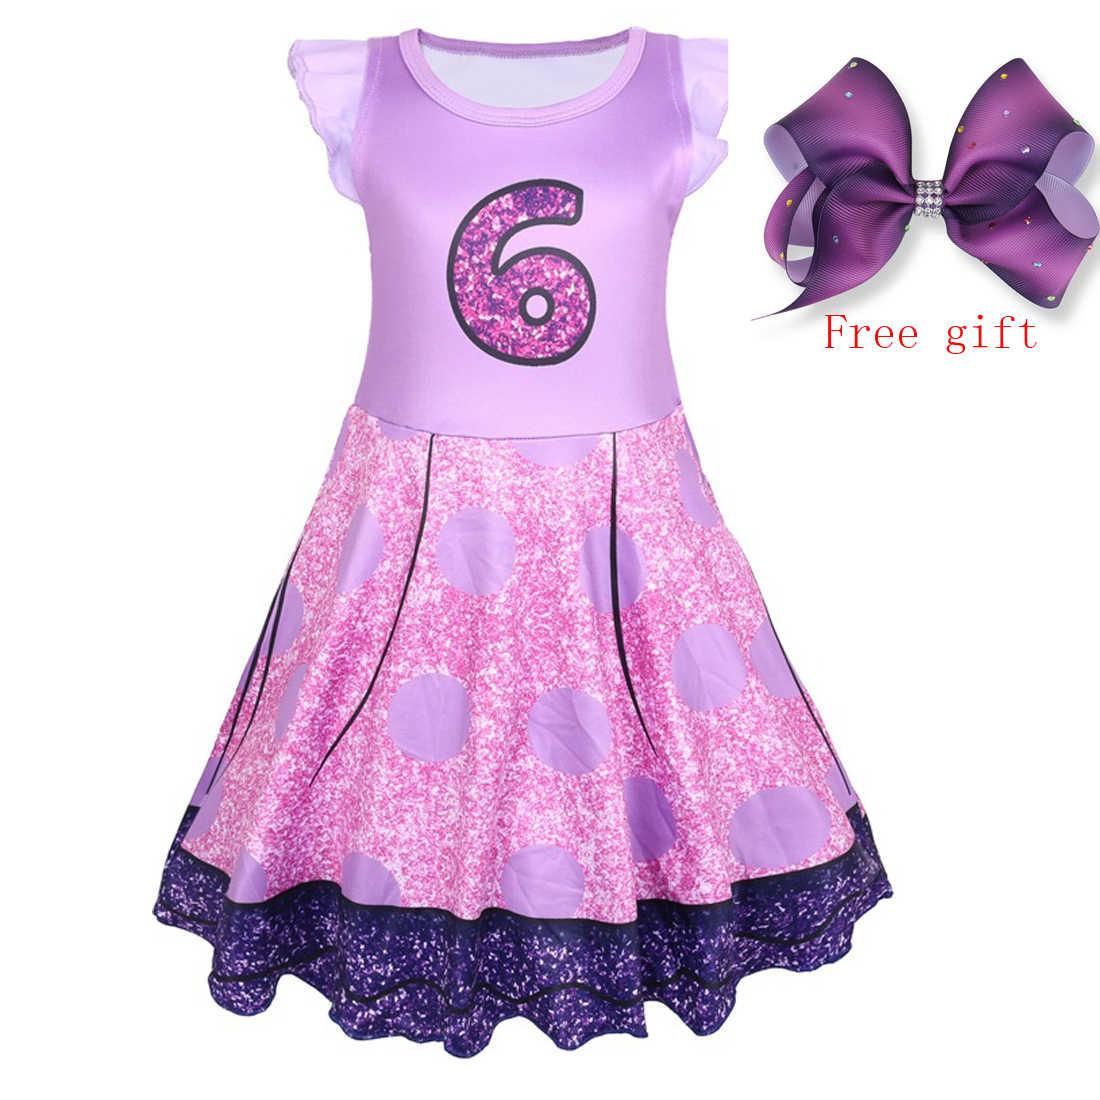 4052b0ad45d4 2019 Girl Unicorn Tutu Dress Rainbow Princess Girl Party Dress Toddler Baby  lol Birthday Halloween Outfits